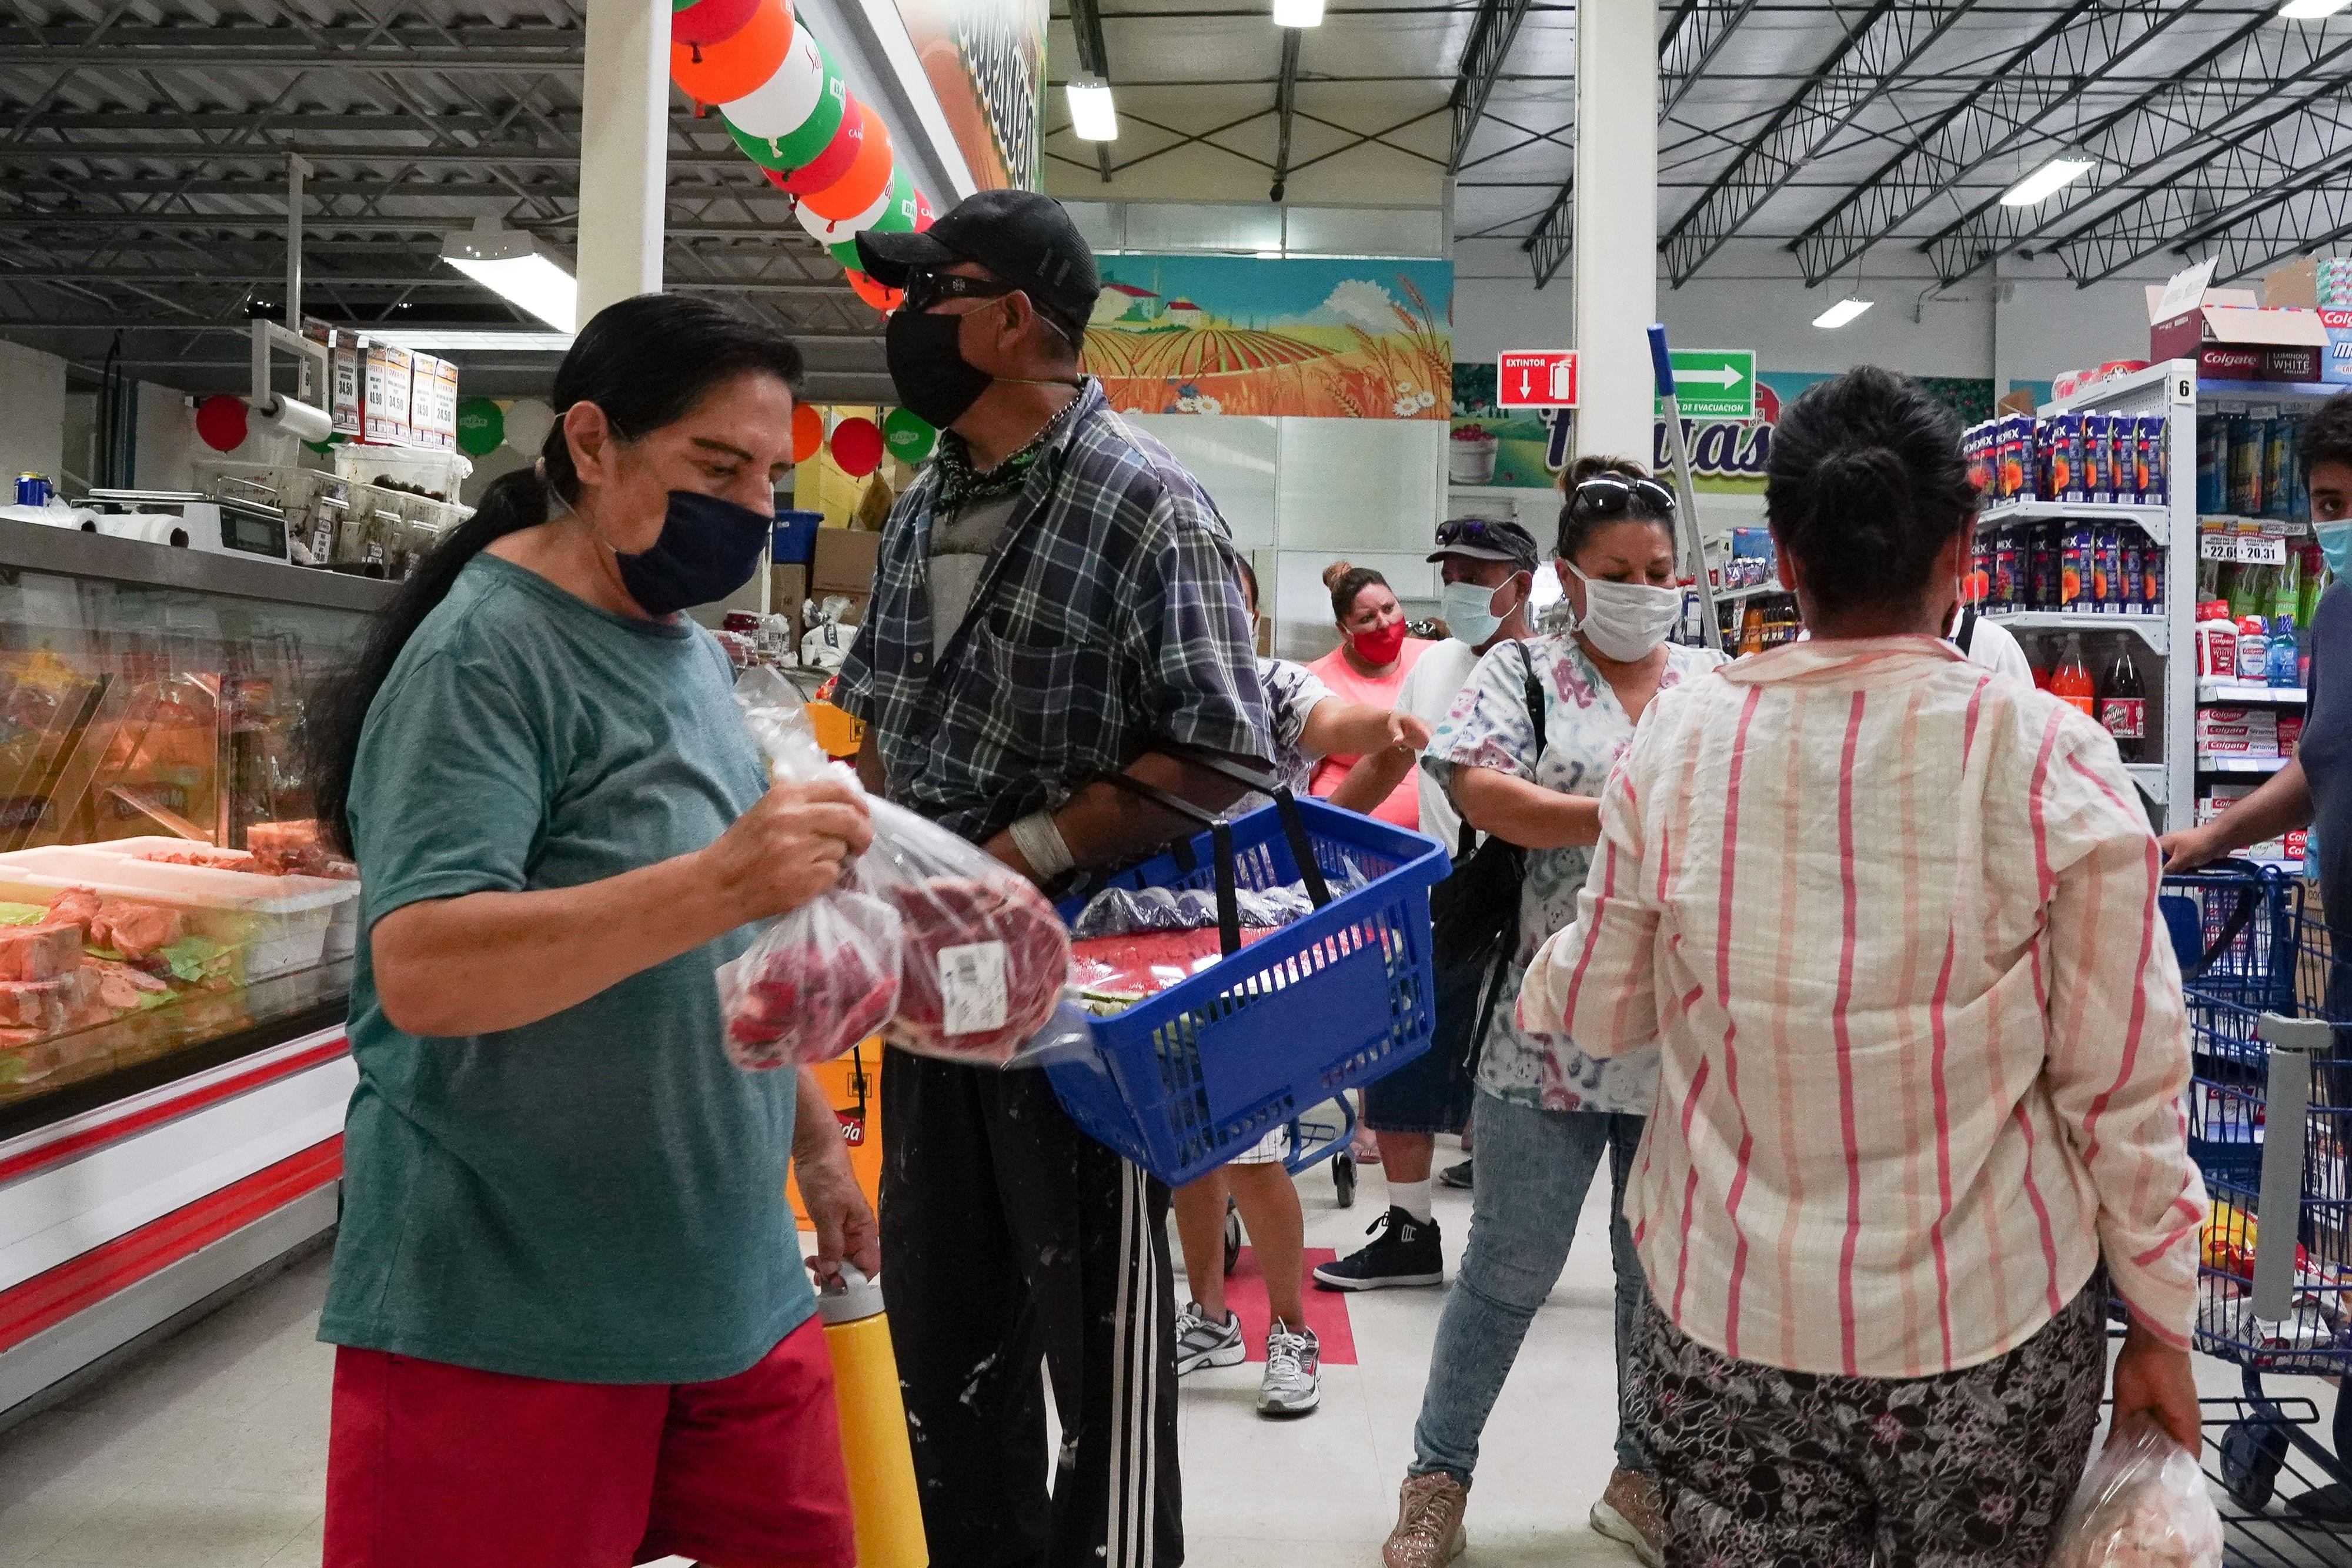 economia - mexico - tienda - negocios - pandemia -covid19 - coronavirus - 03082020